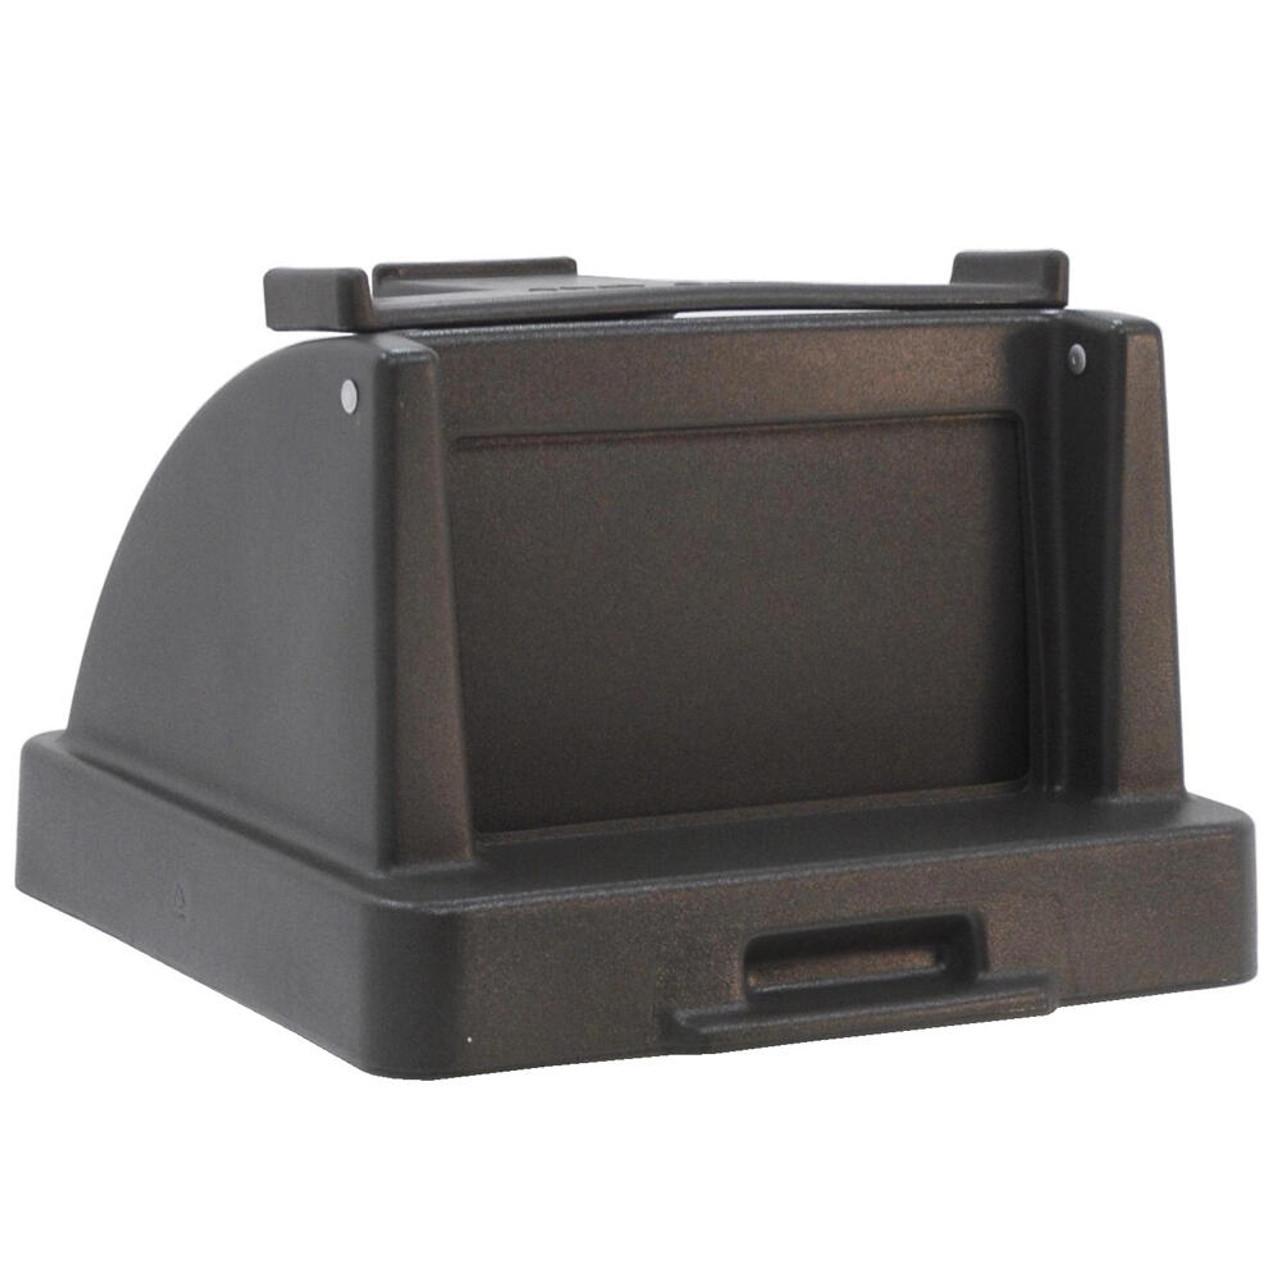 20.5 x 20.5 Push Door Lid with Tray Caddy TF1405/TF1415 (Many Colors)